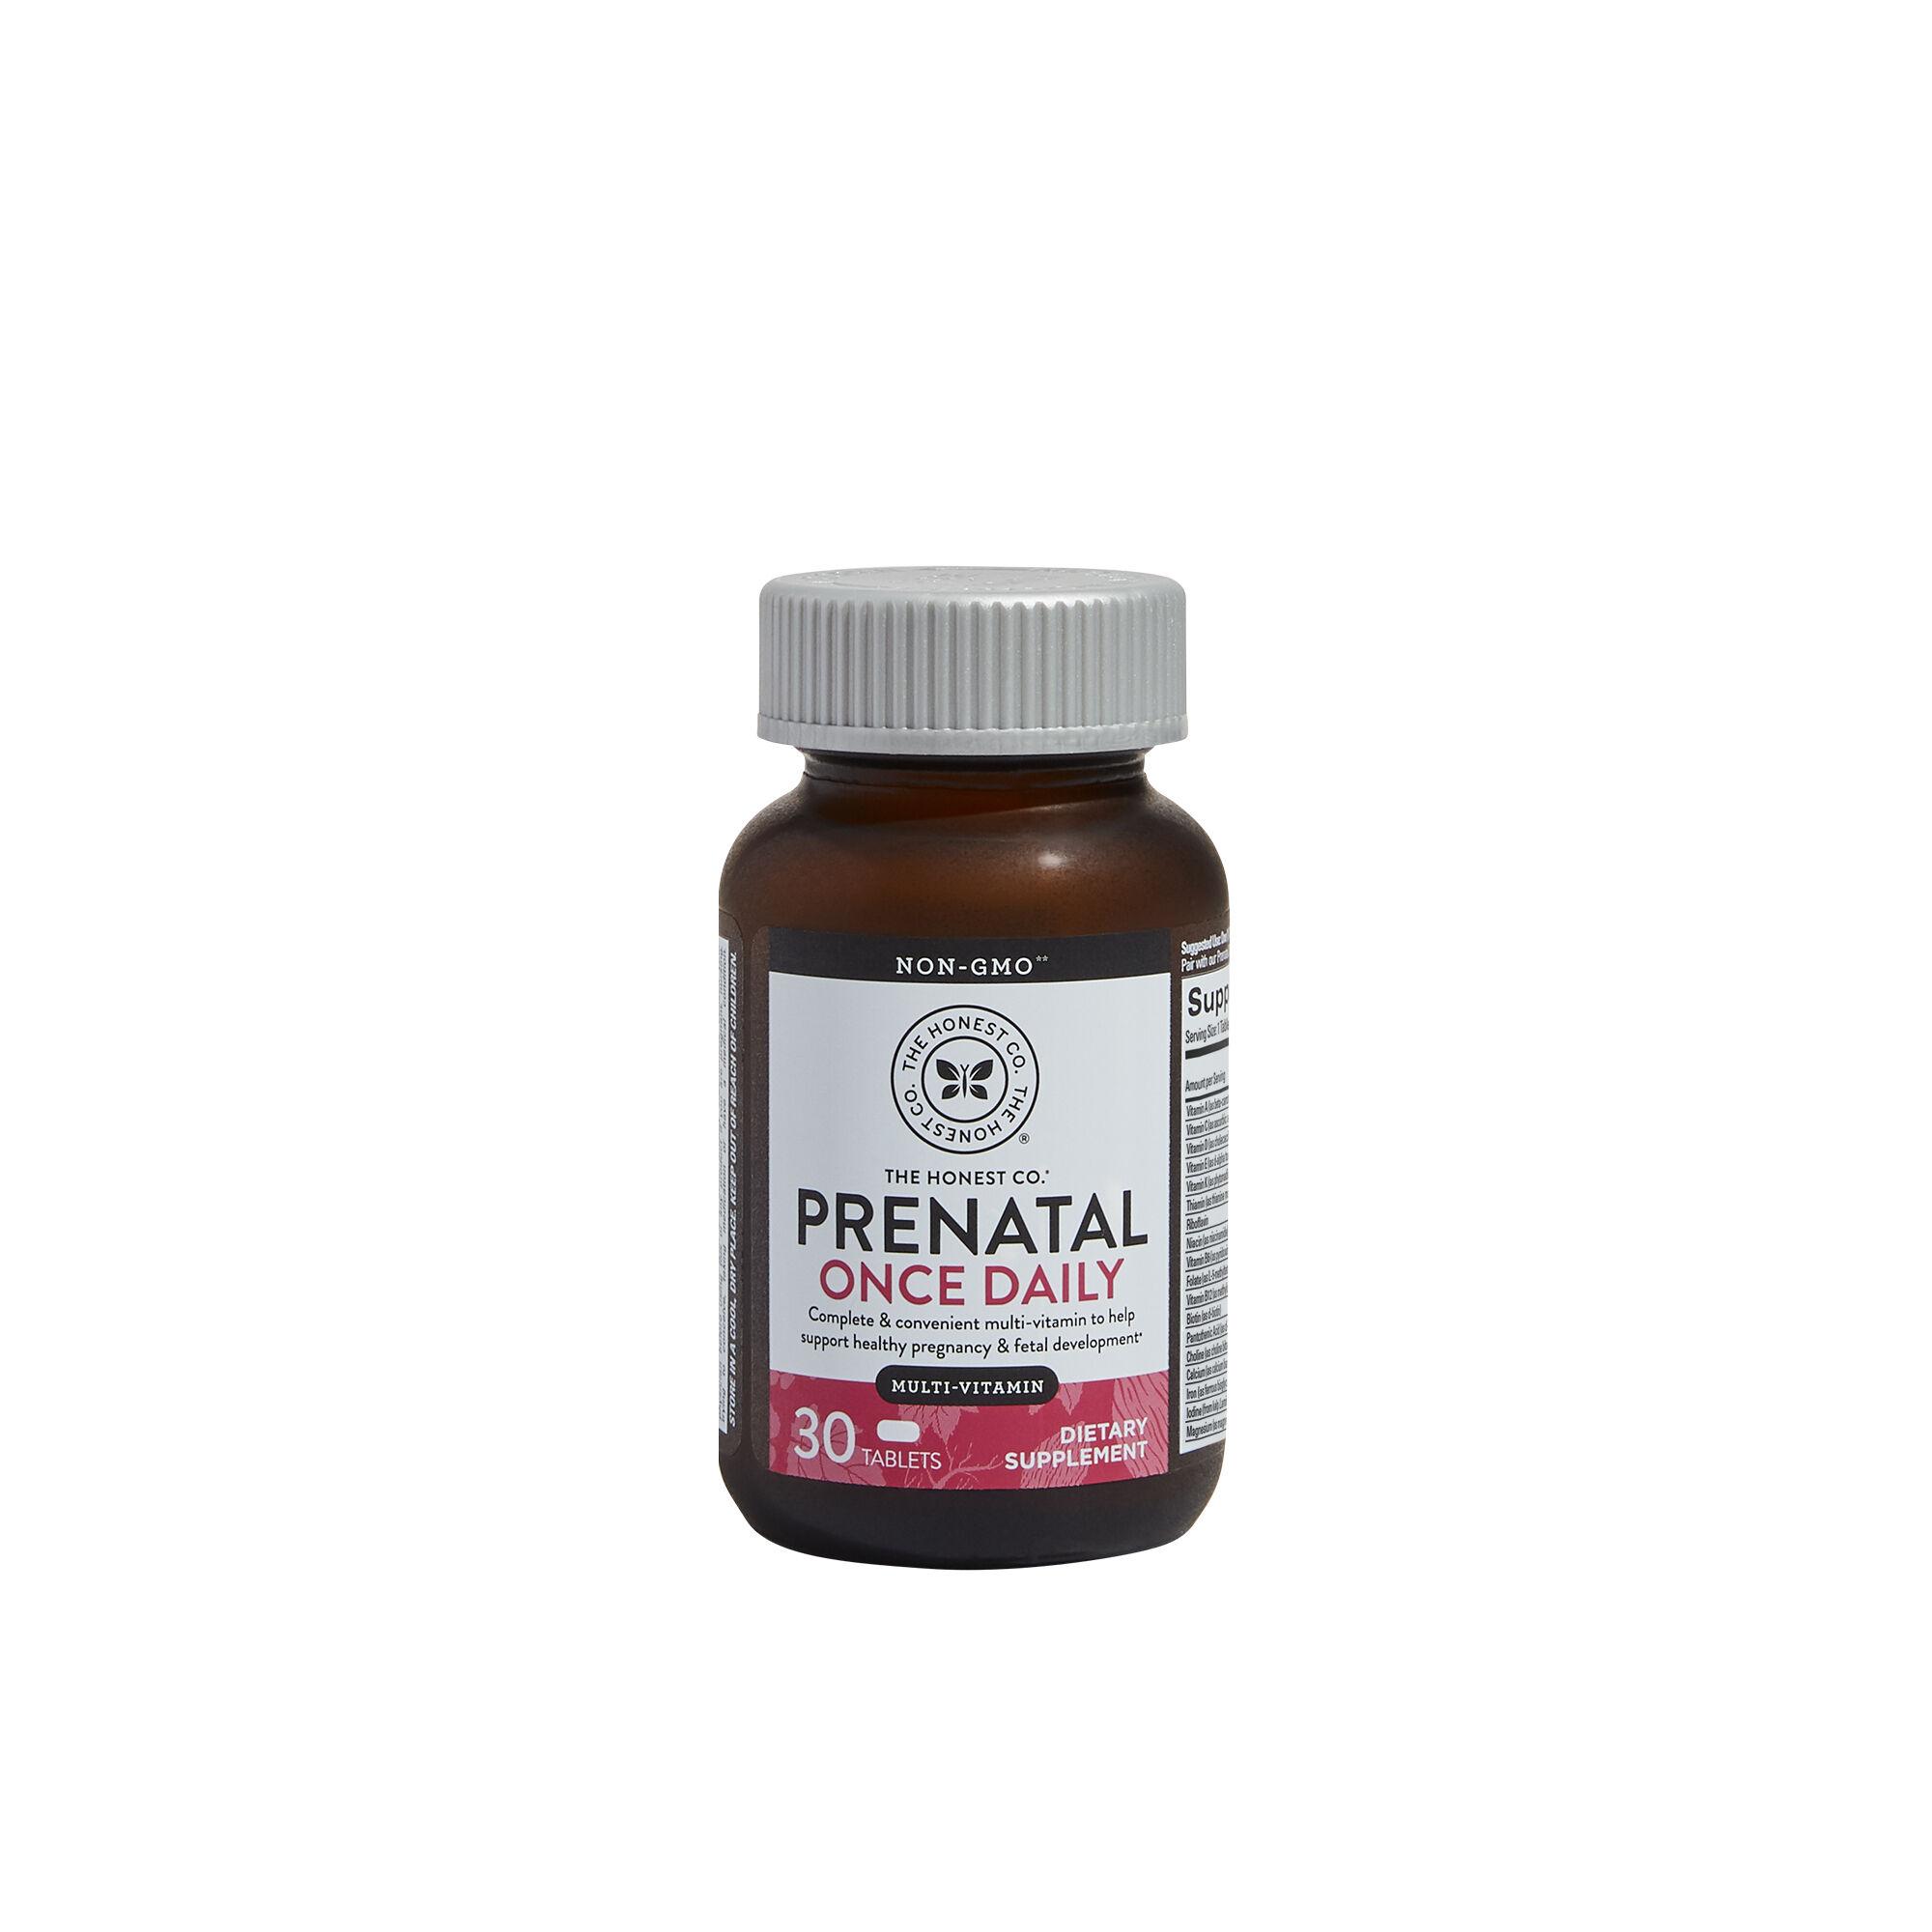 Prenatal Once Daily Vitamin Jar